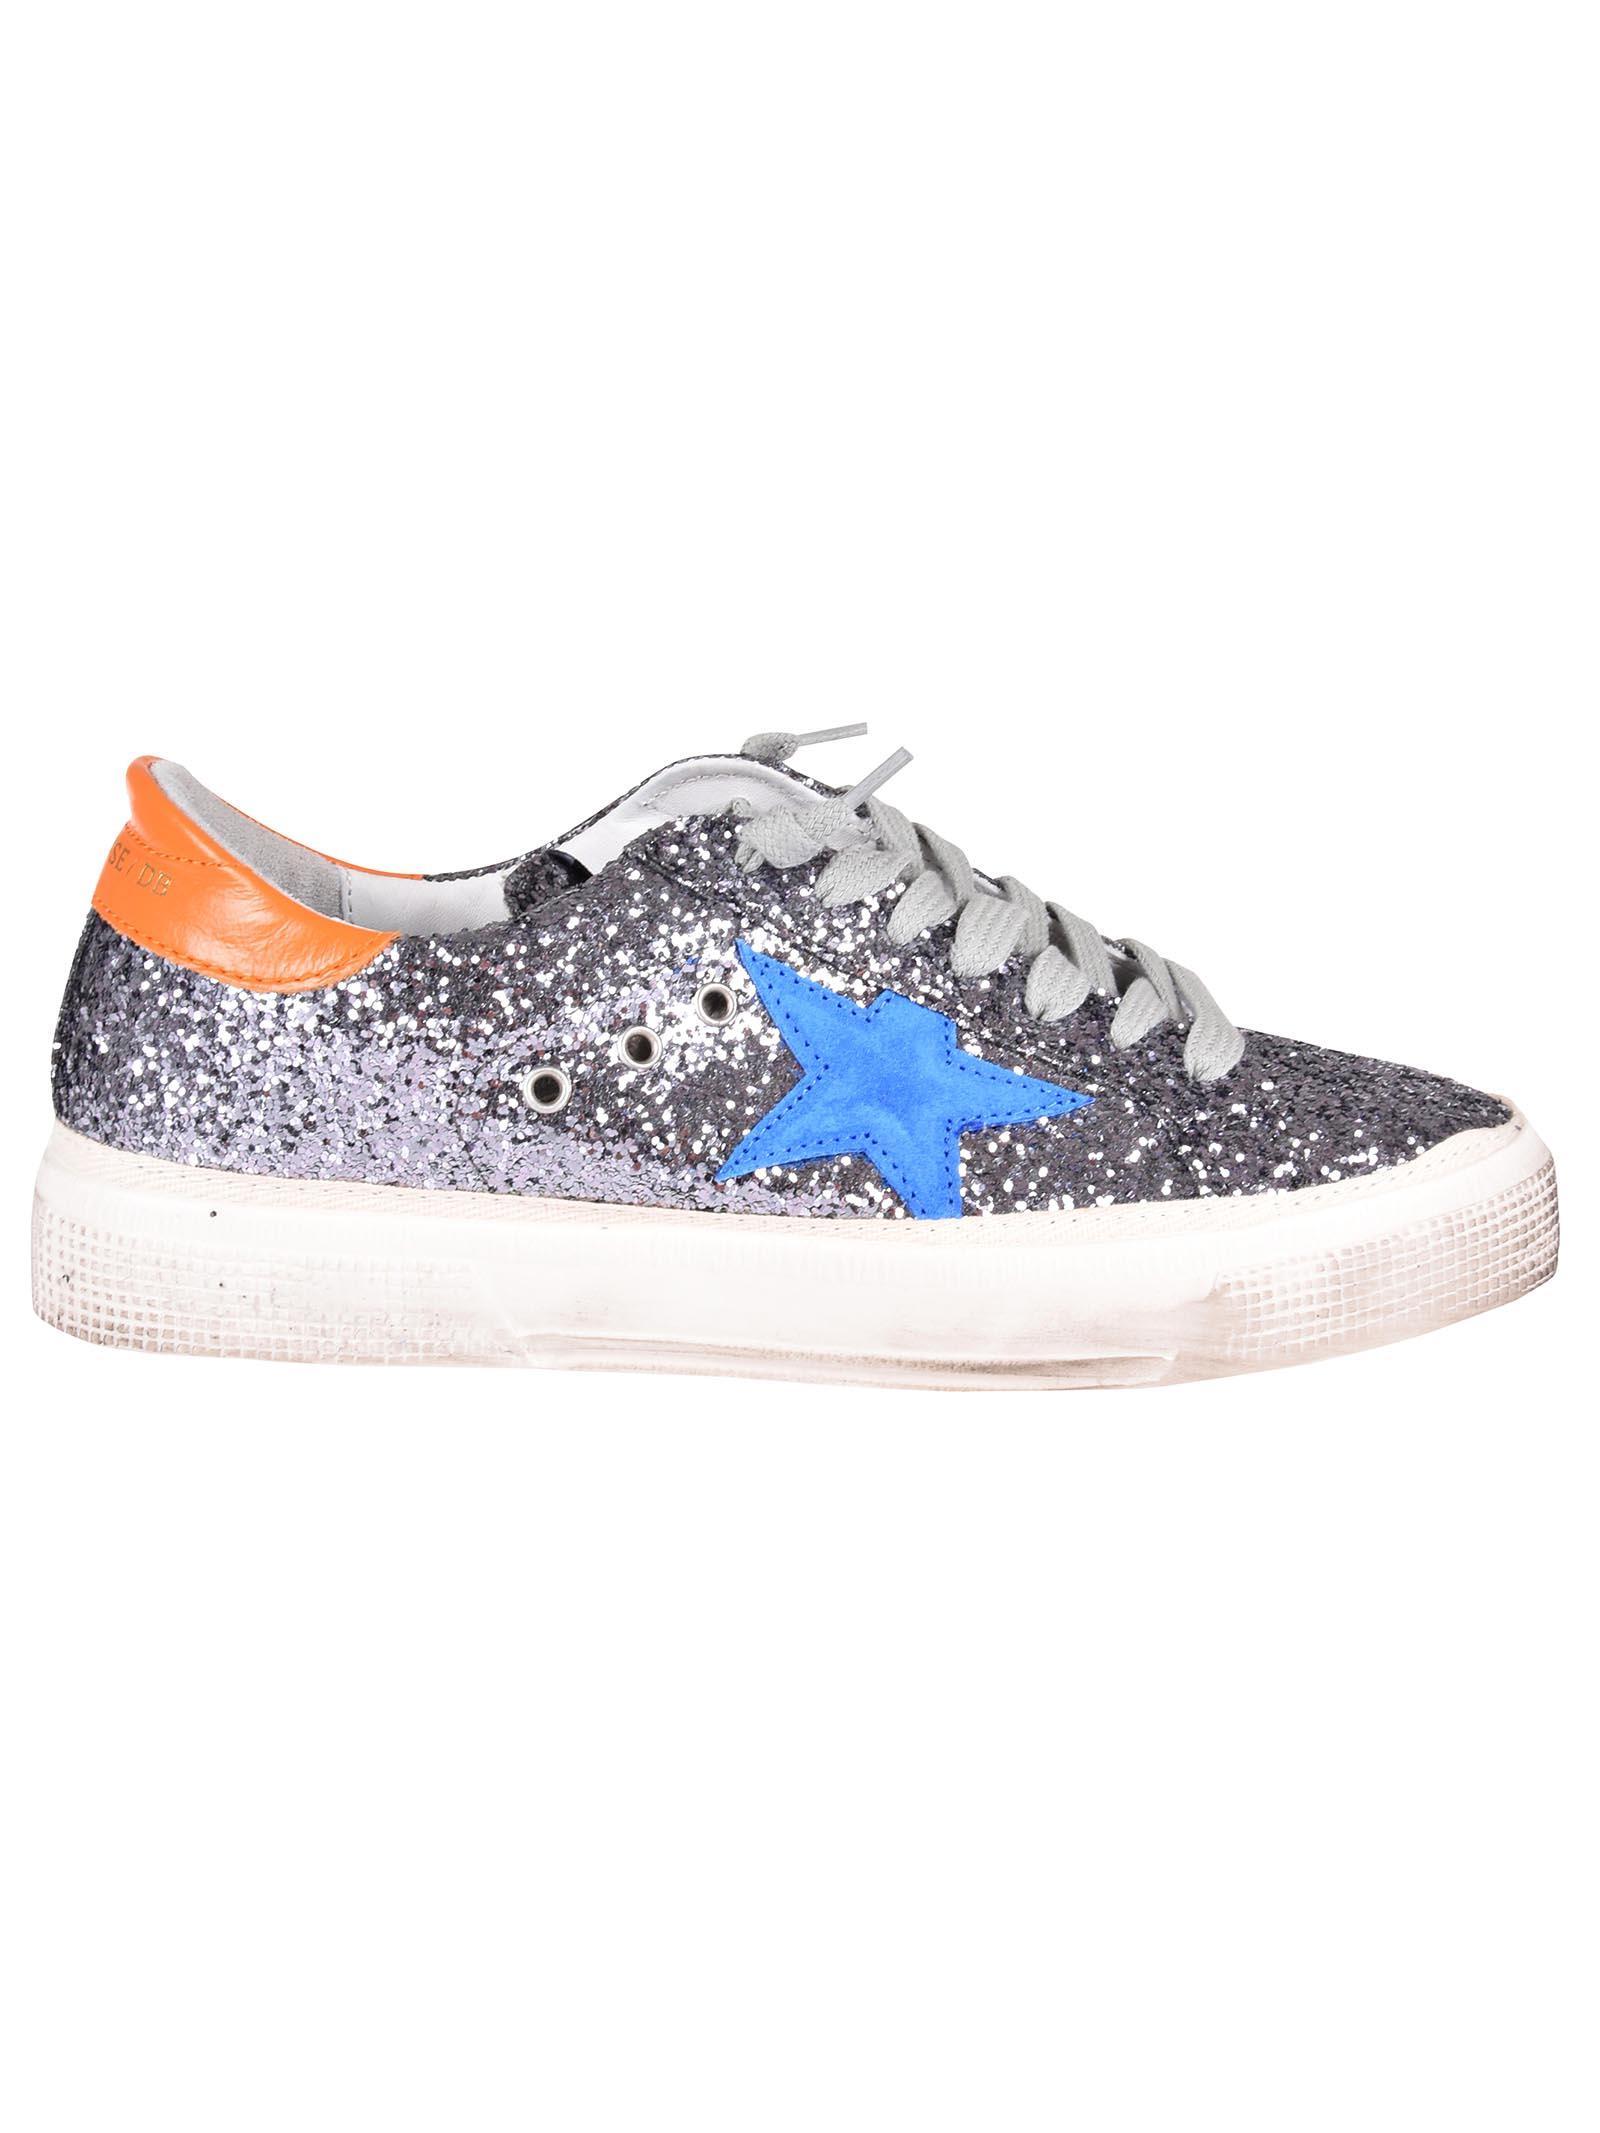 457fad9b444b Golden Goose May Sneakers In Grey Glitter Blue Star